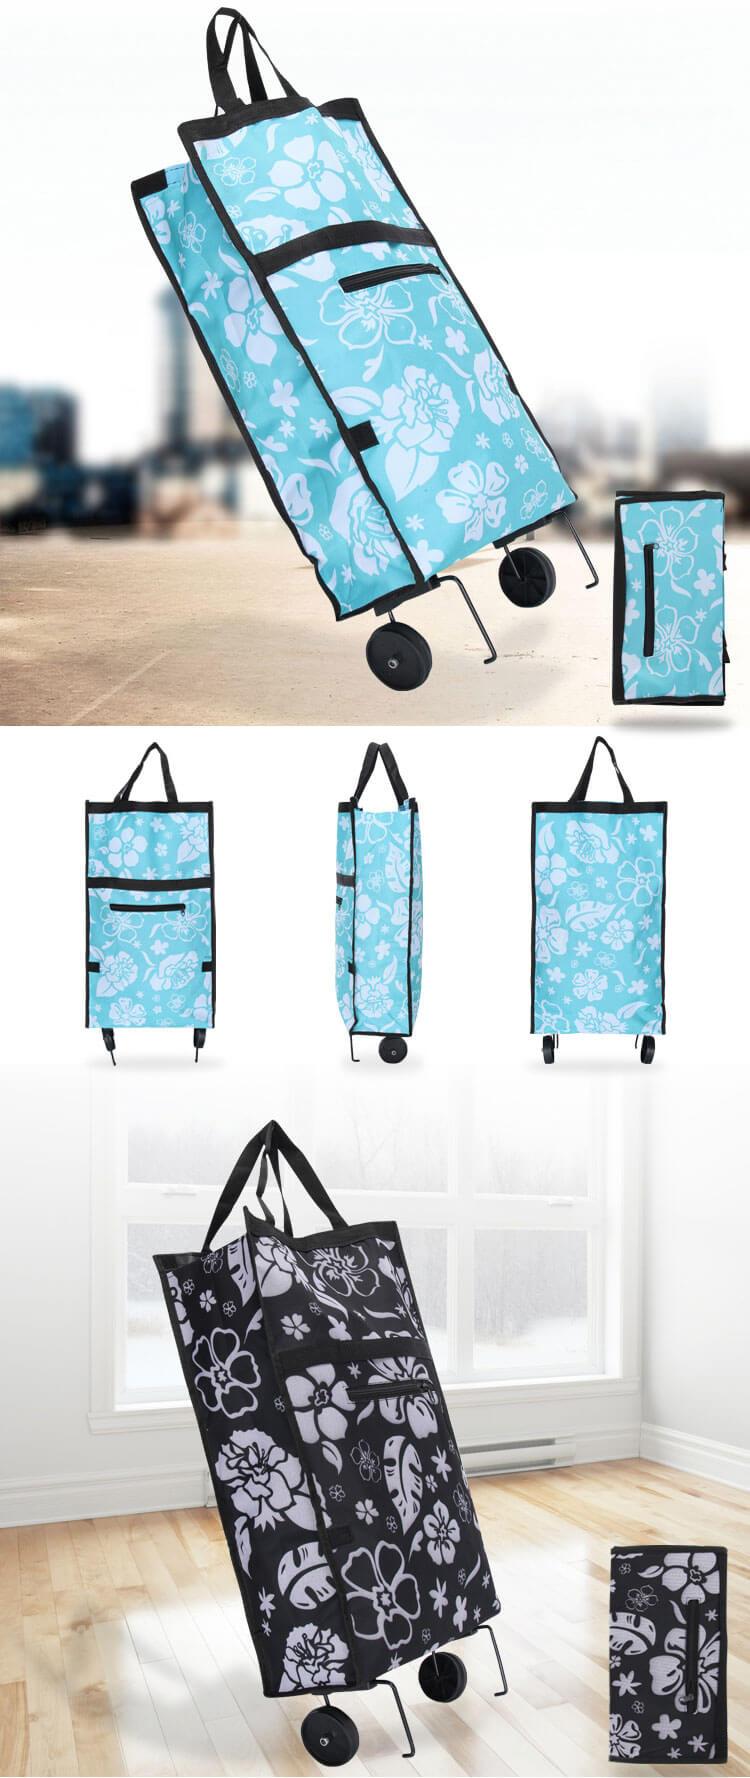 2 Wheels Disabled Multi-Function Vegetable Fruit Shopping Cart Bag